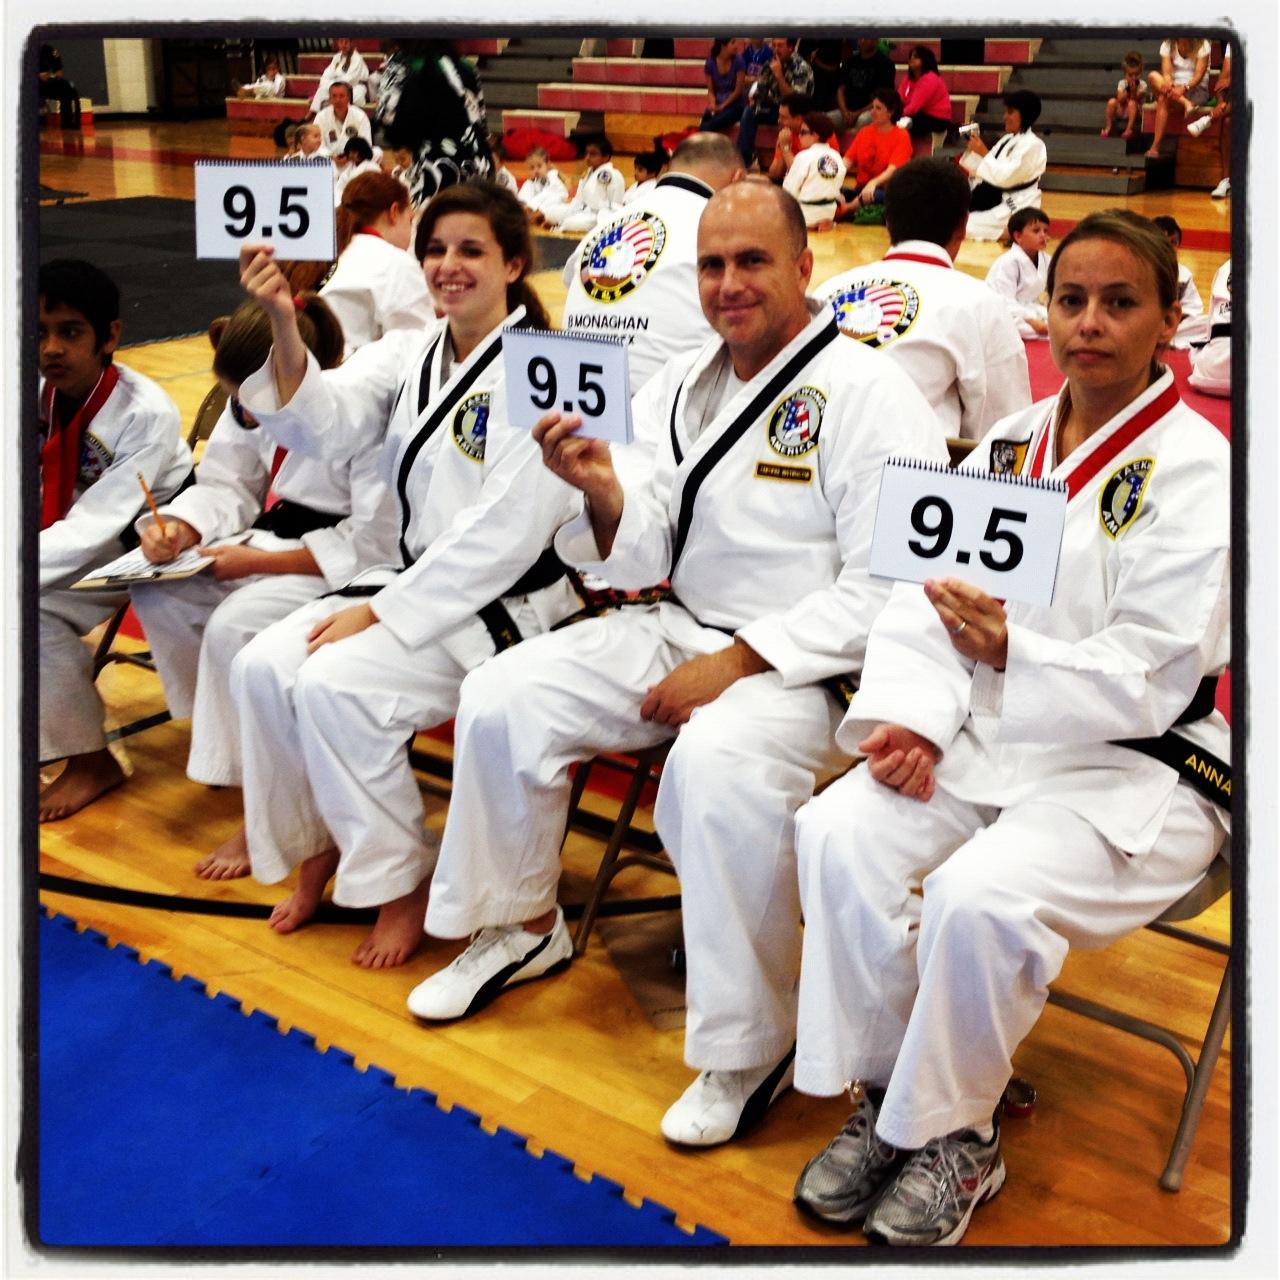 Karate Judges From Southlake TX At Tournament.jpg